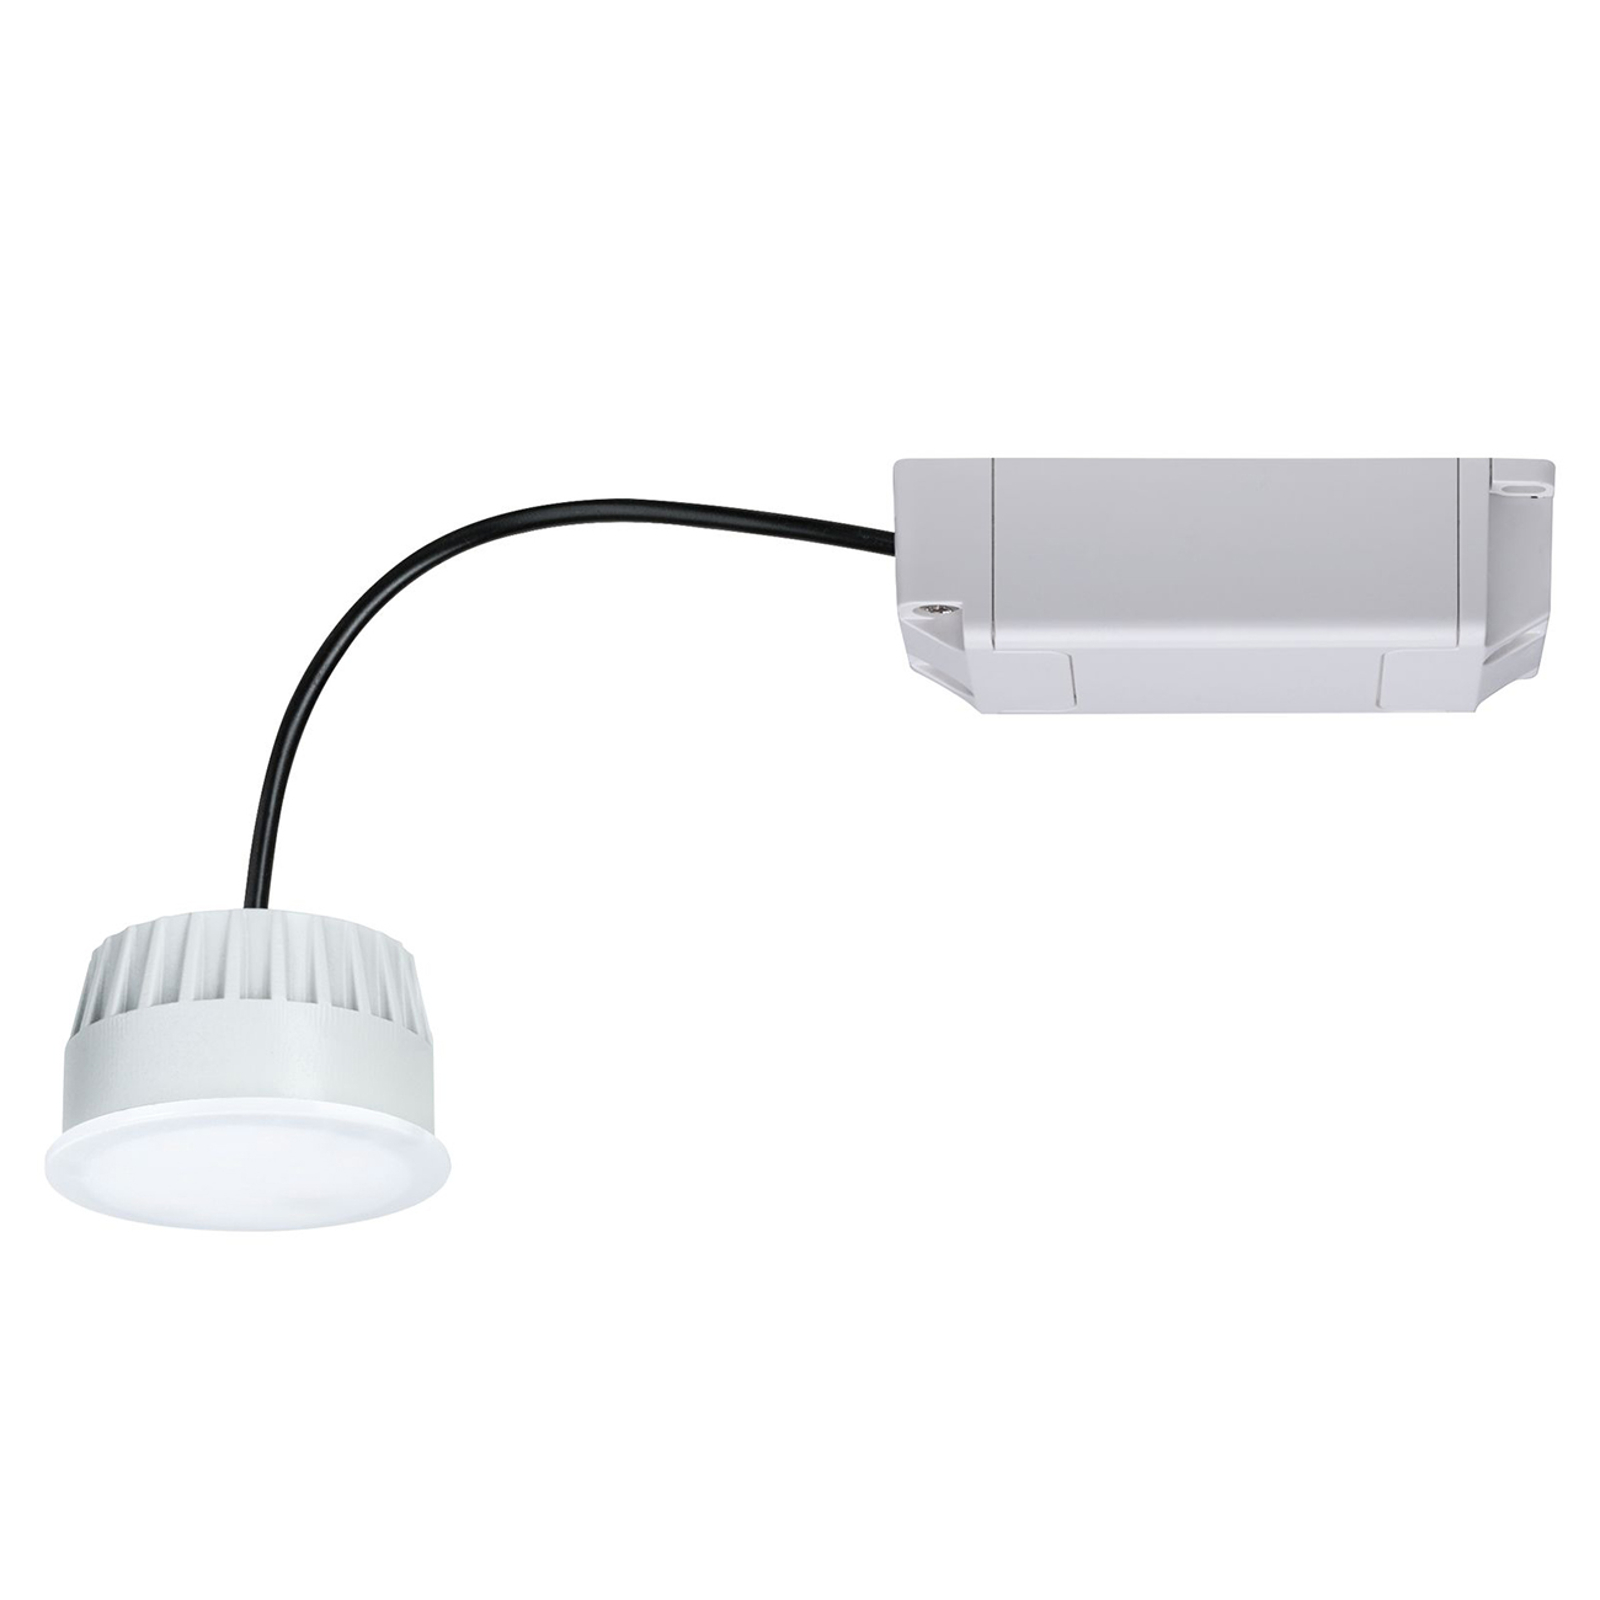 Dove acquistare Paulmann Smart Friends ZigBee LED-Modul Coin 2700K